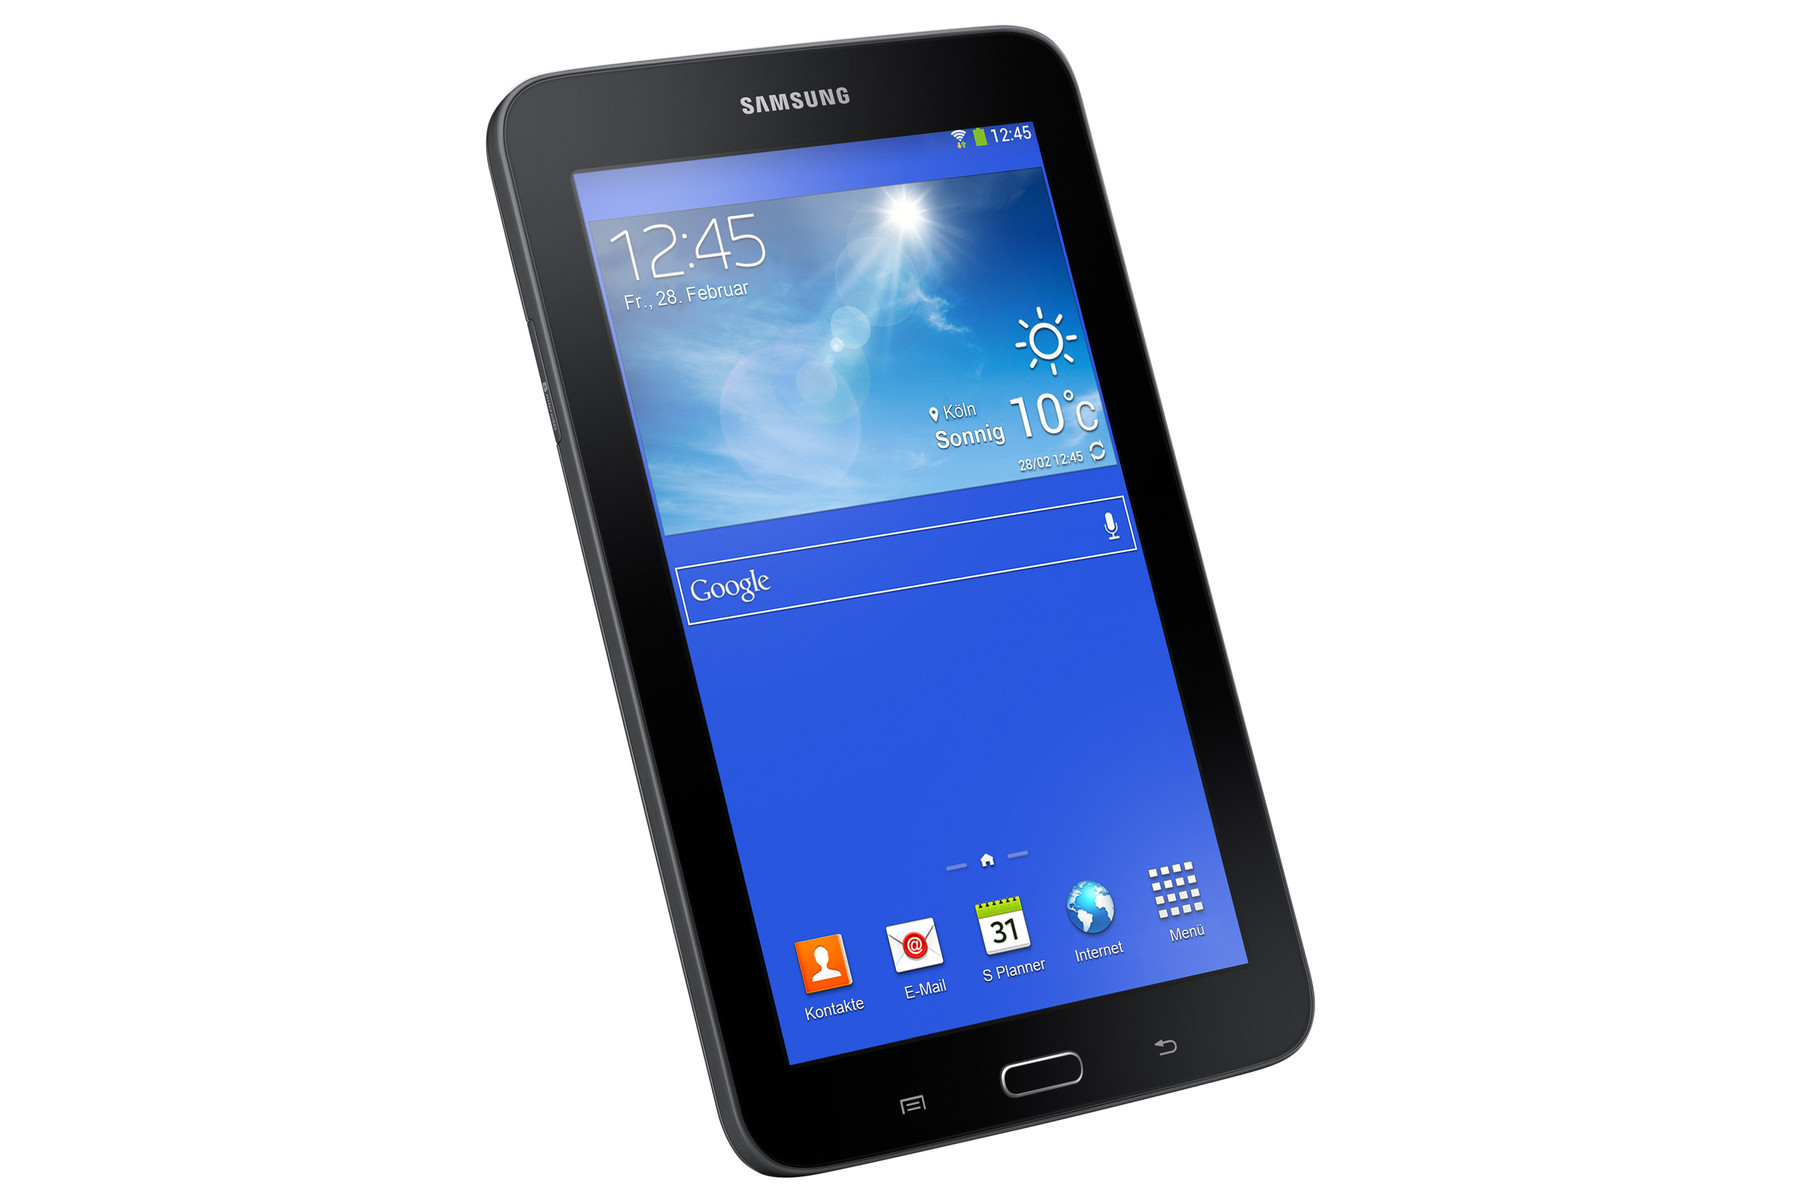 test update samsung galaxy tab 3 7 0 lite tablet tests. Black Bedroom Furniture Sets. Home Design Ideas